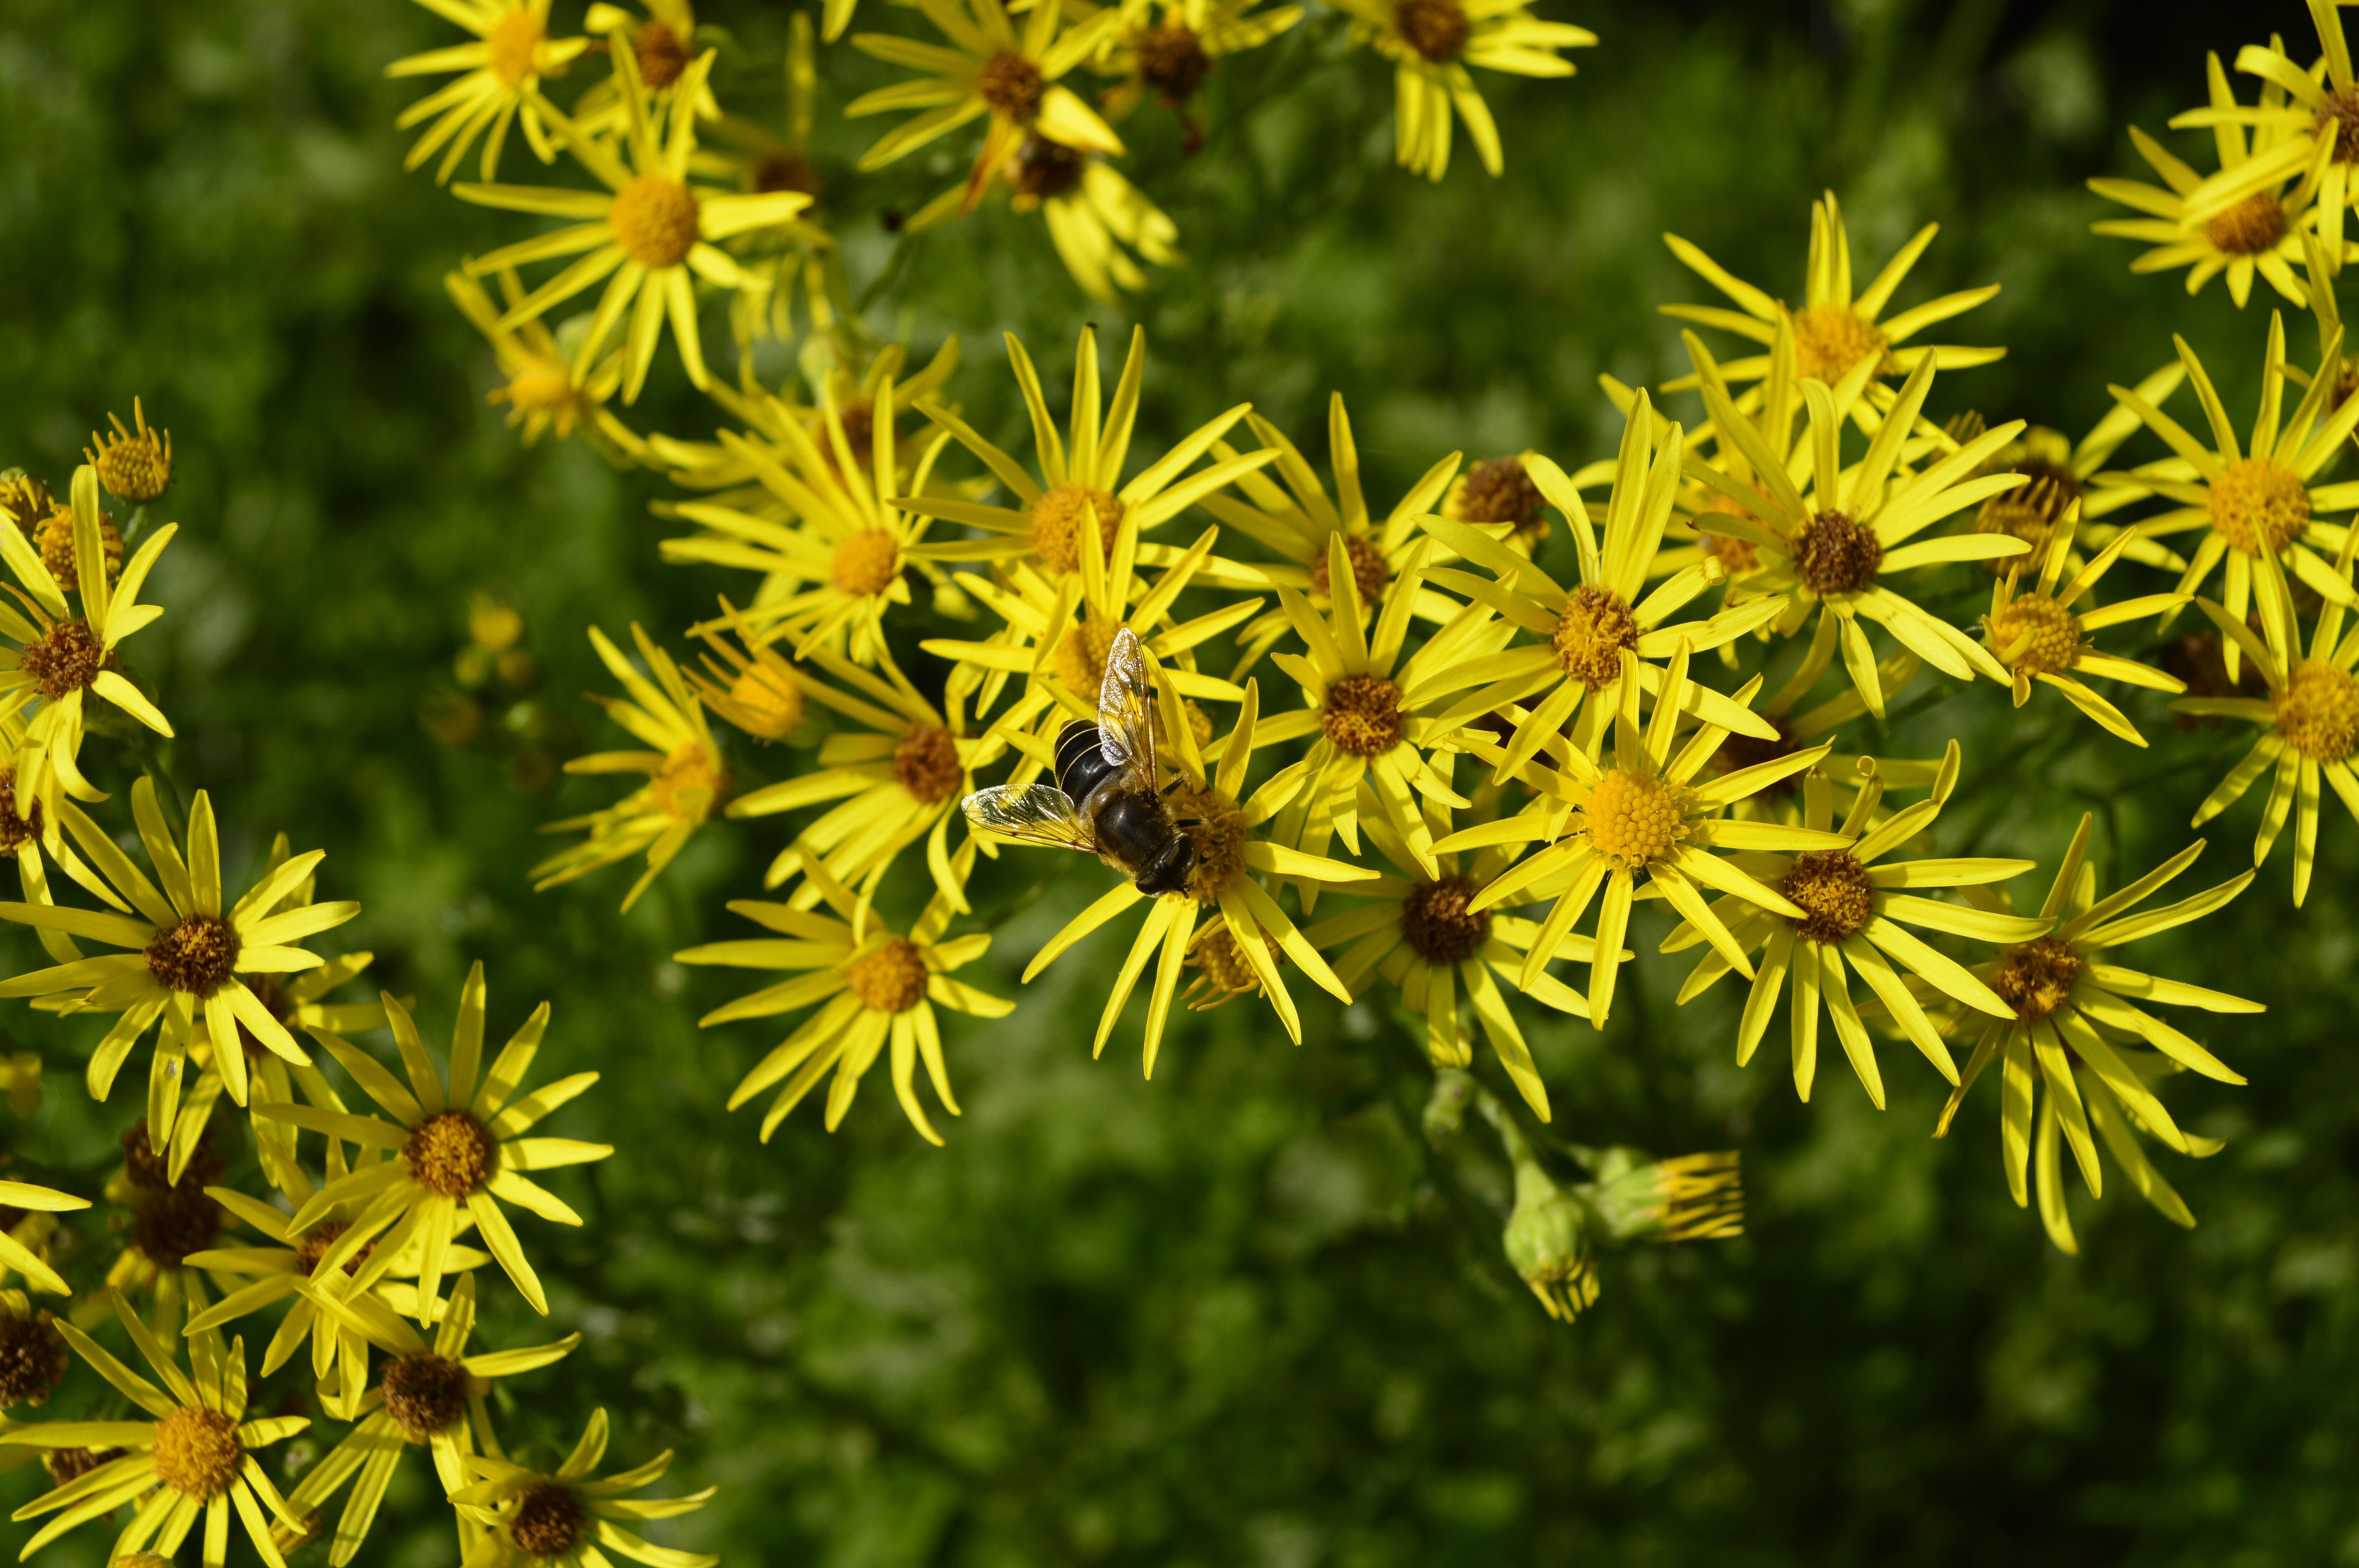 natureza ramo plantar prado folha flor floral verde cor natural botnica amarelo flora flor amarela flores silvestres flores arbusto